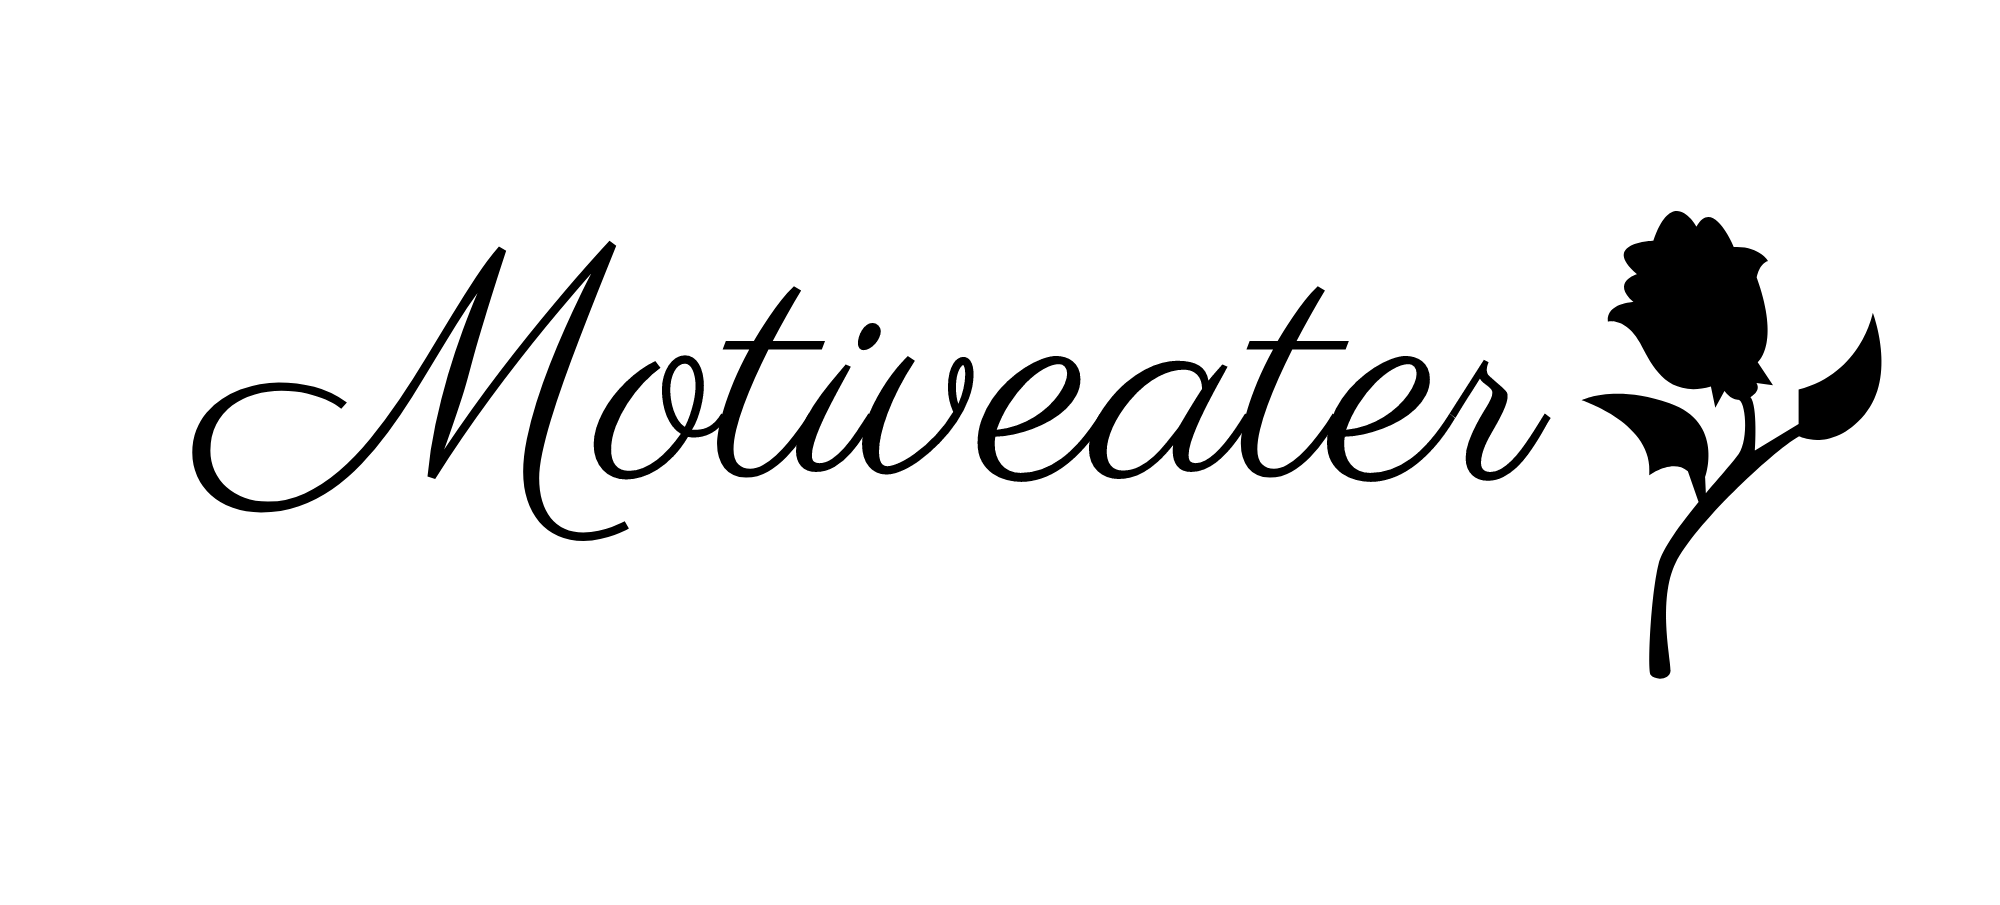 Motiveater-logo.png